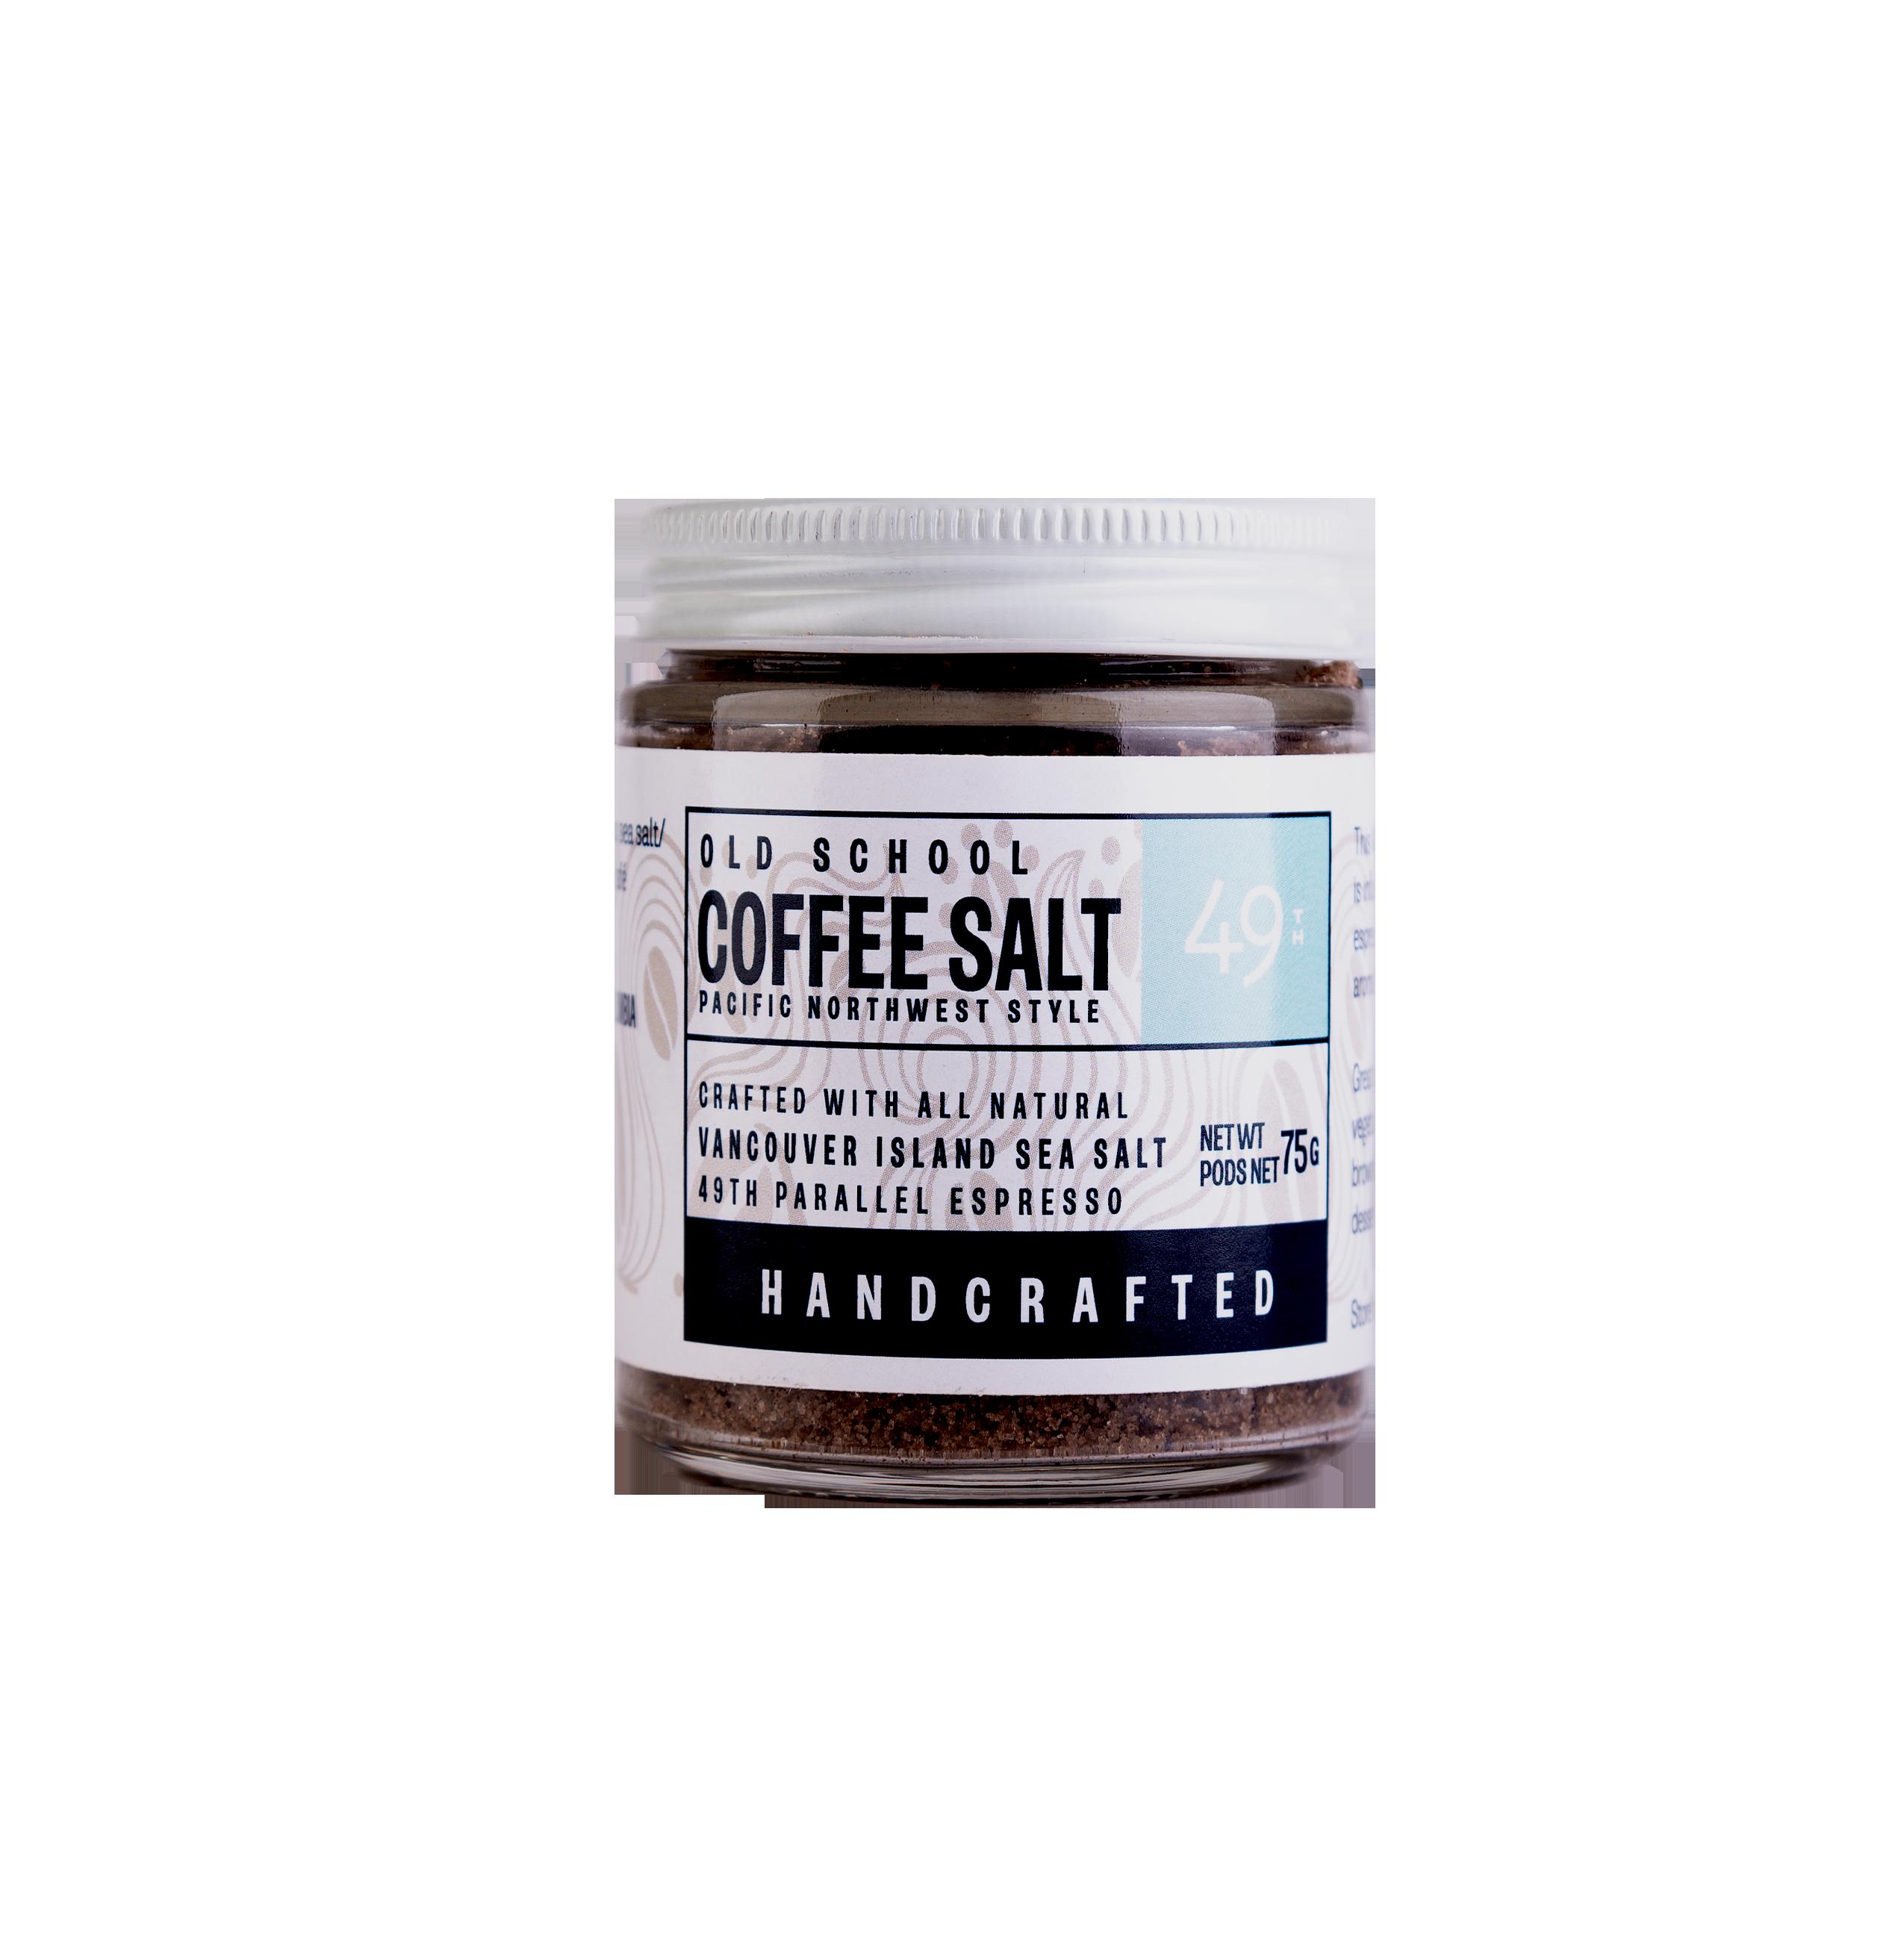 Coffee Salt Pacific Northwest Style